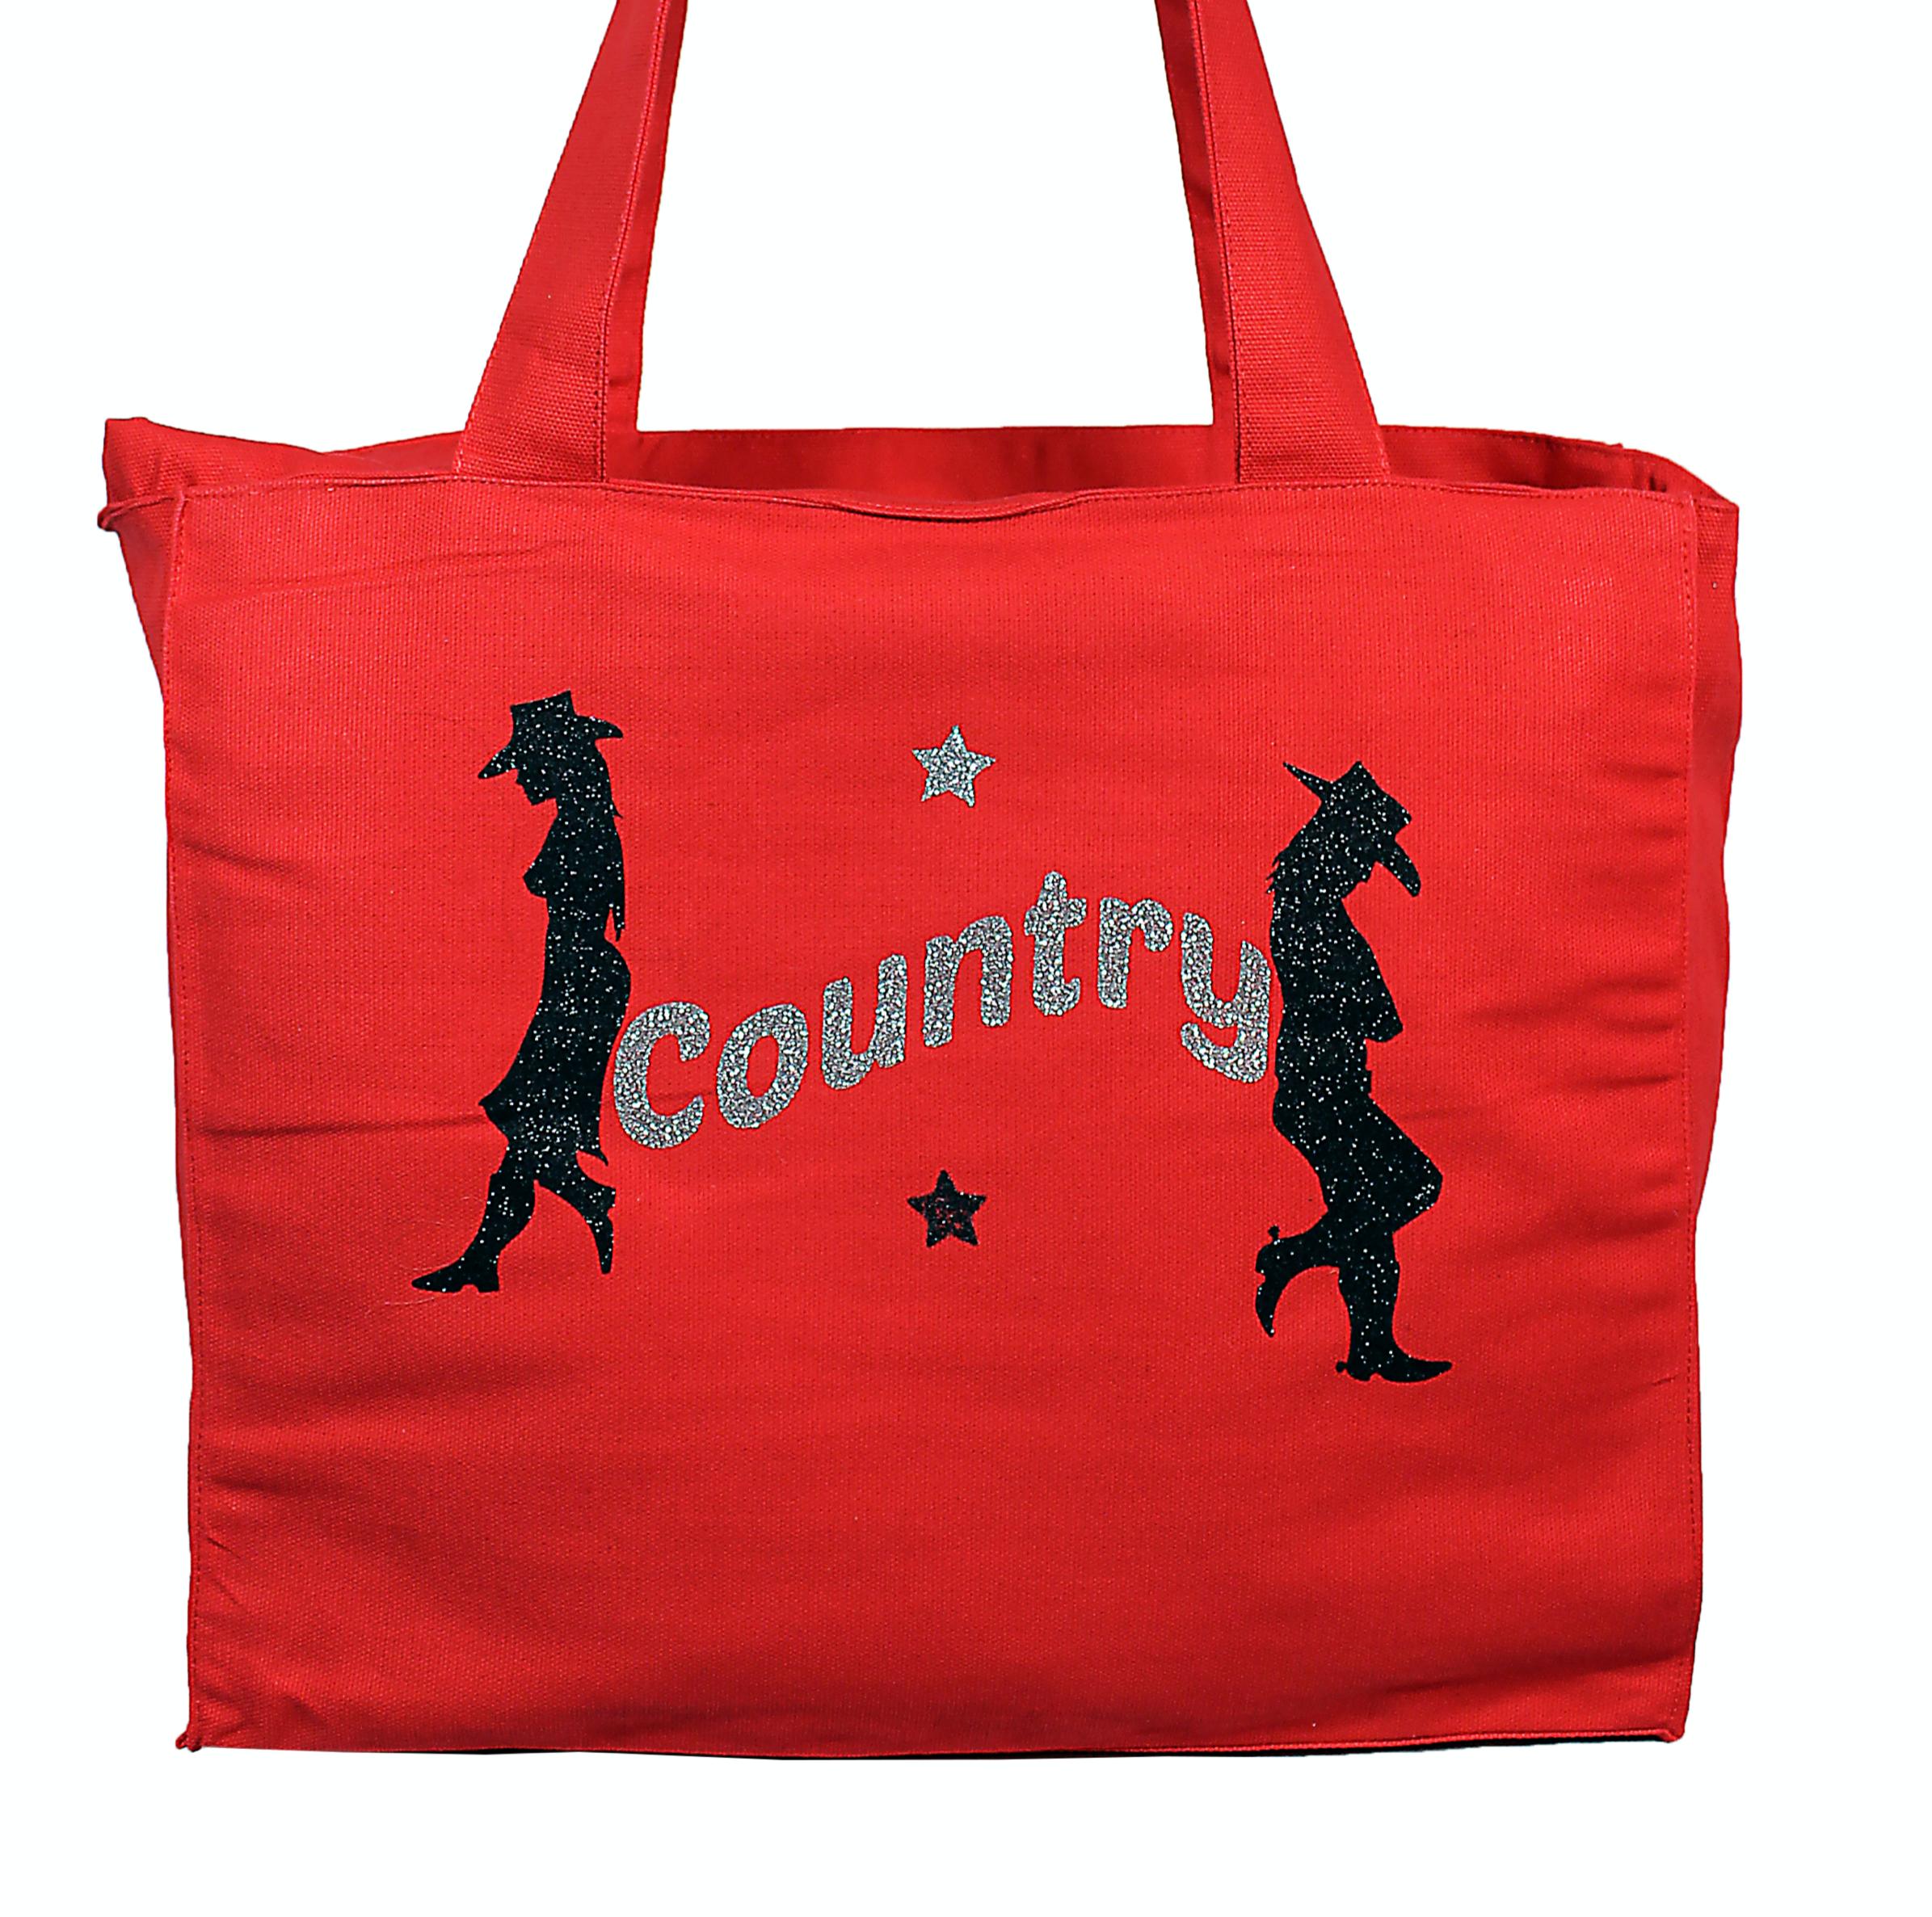 Sac Caba Country